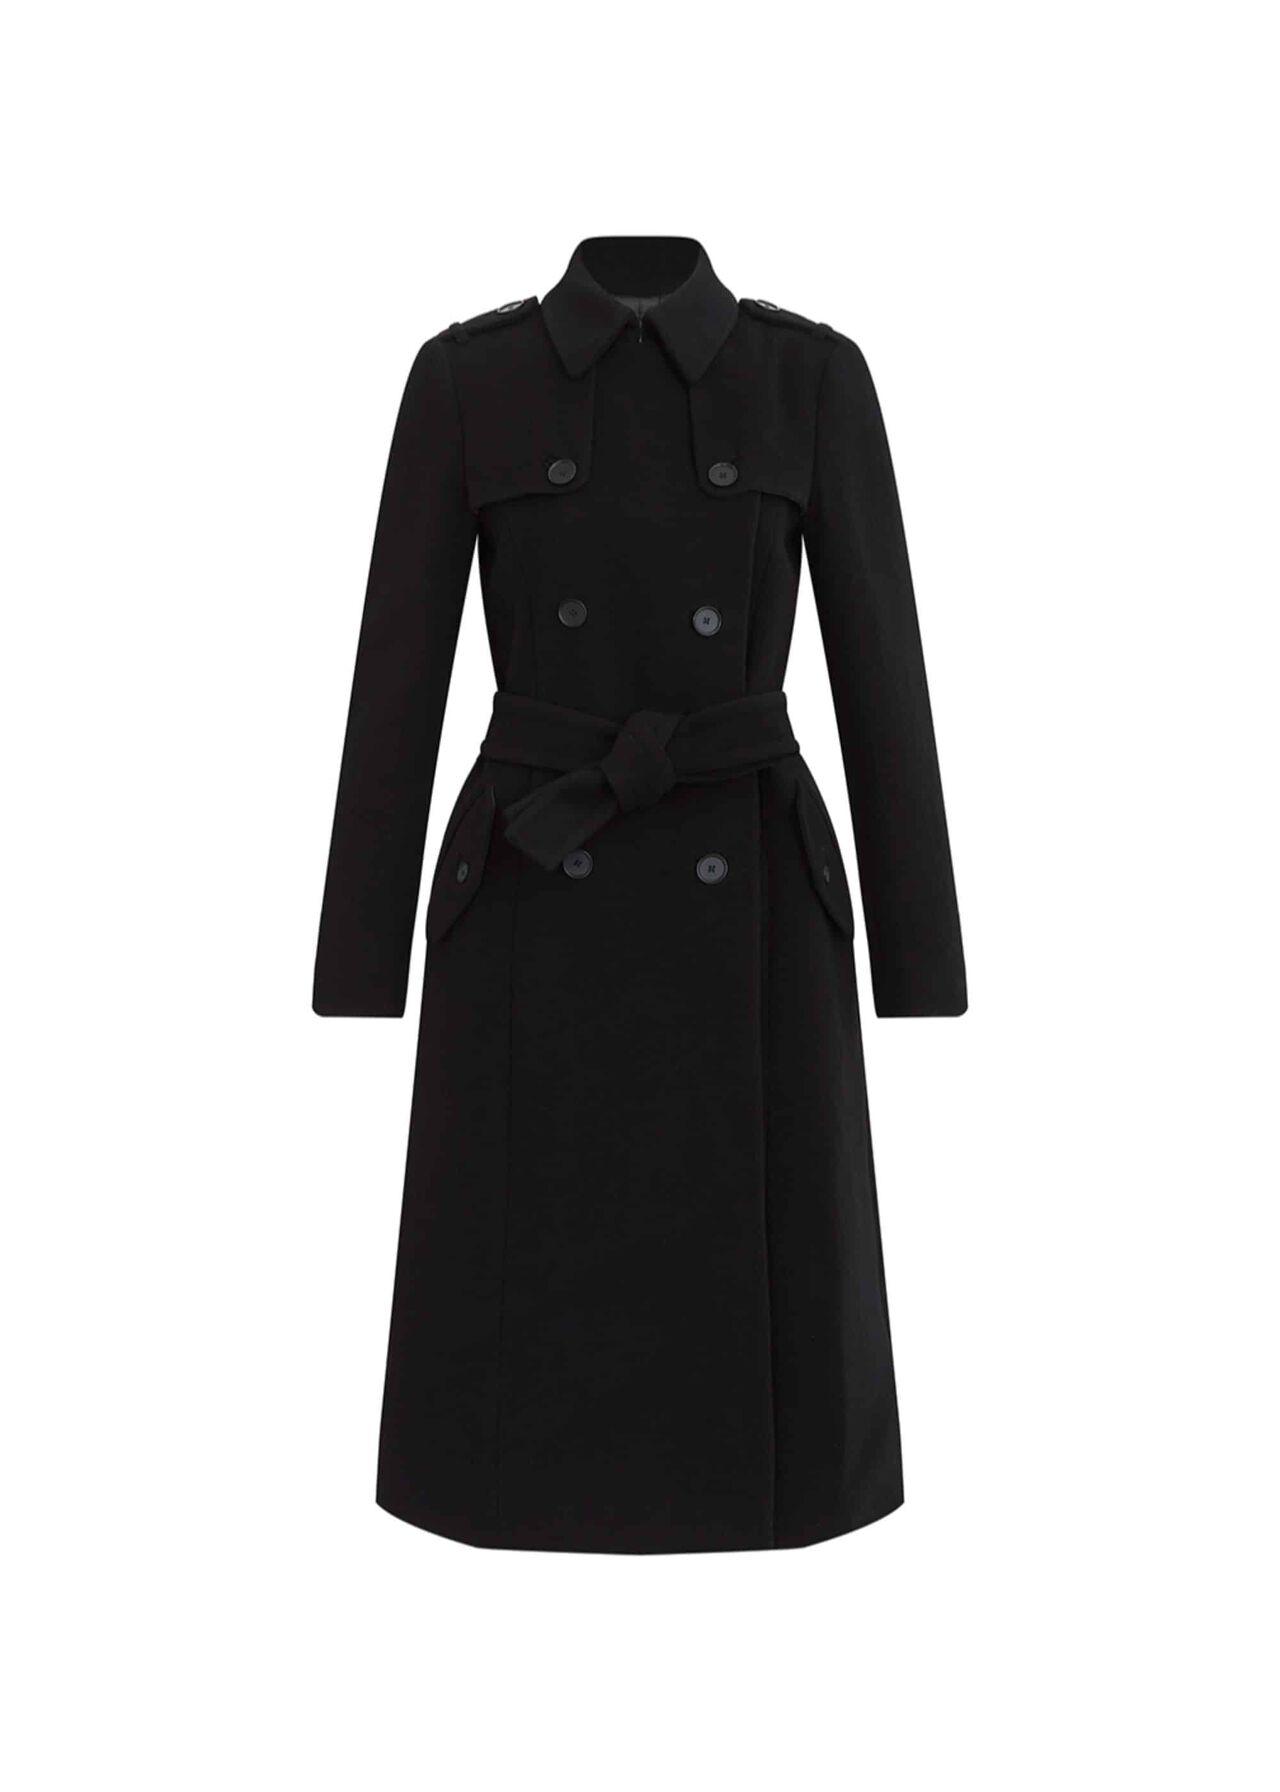 Blythe Coat Black